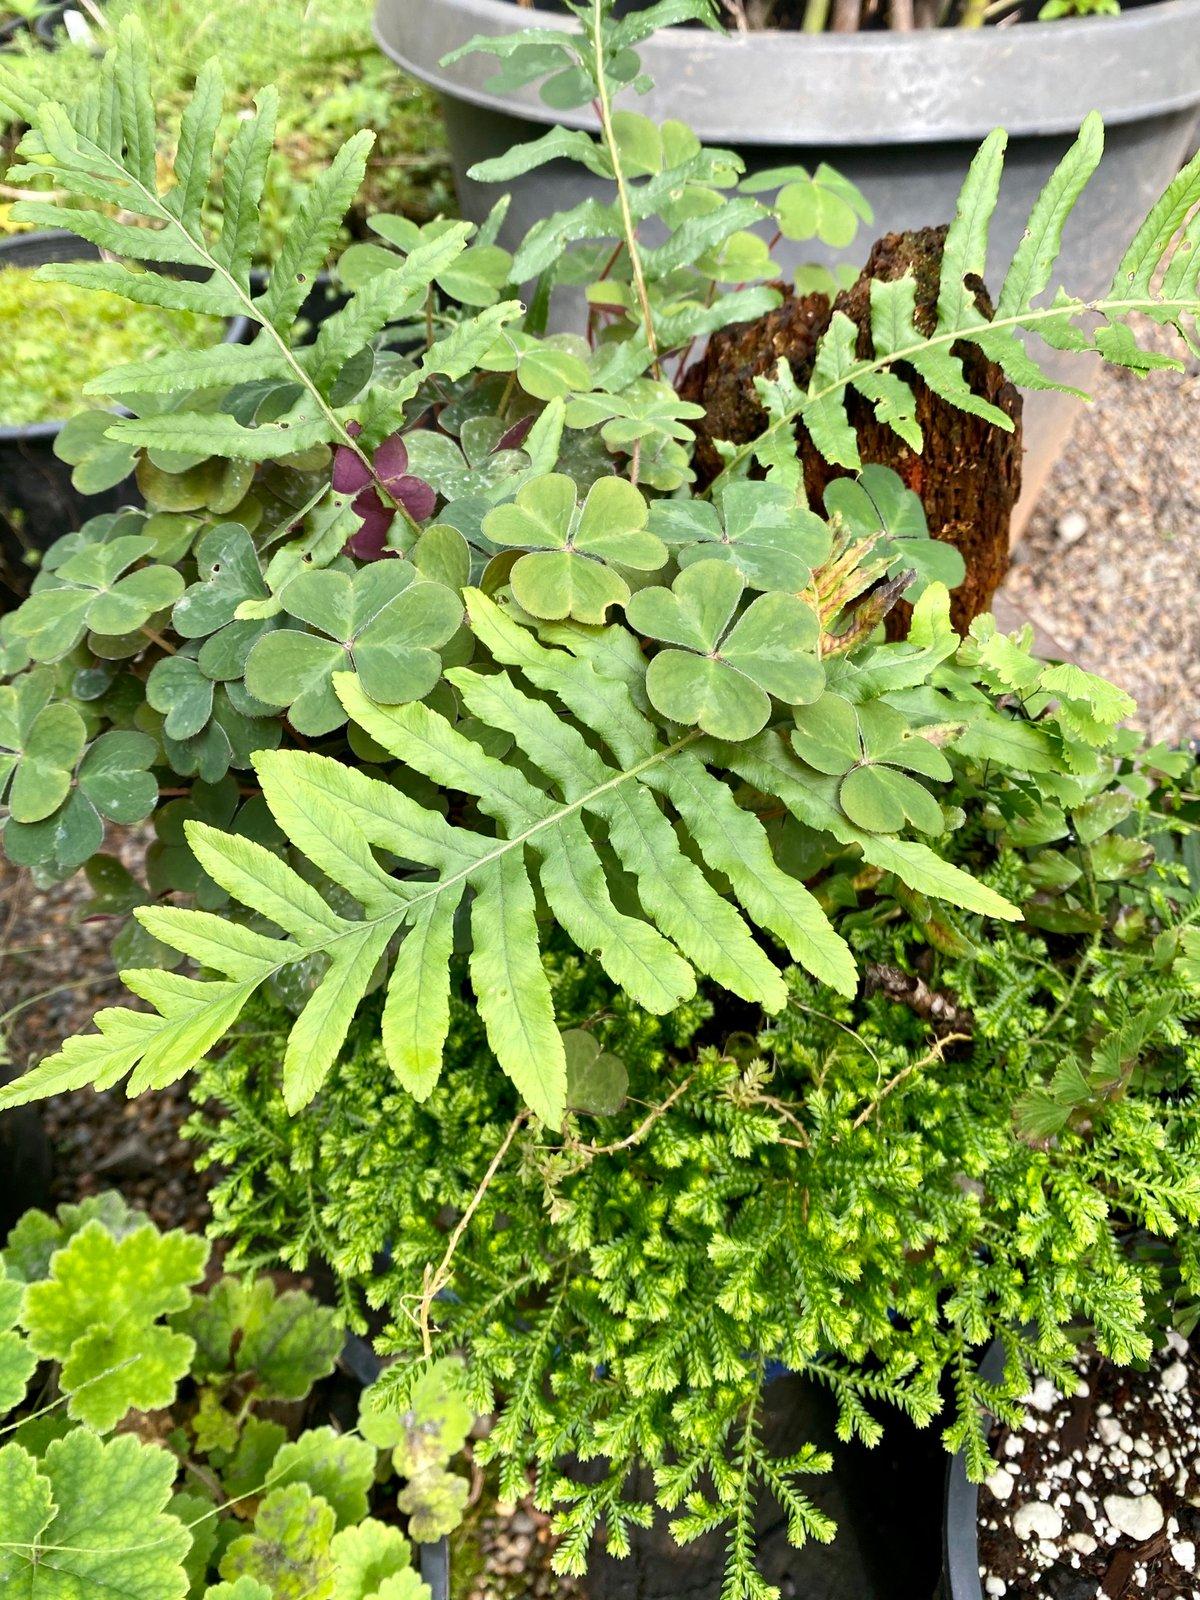 Licorice Fern : Polypodium glycyrrhiza